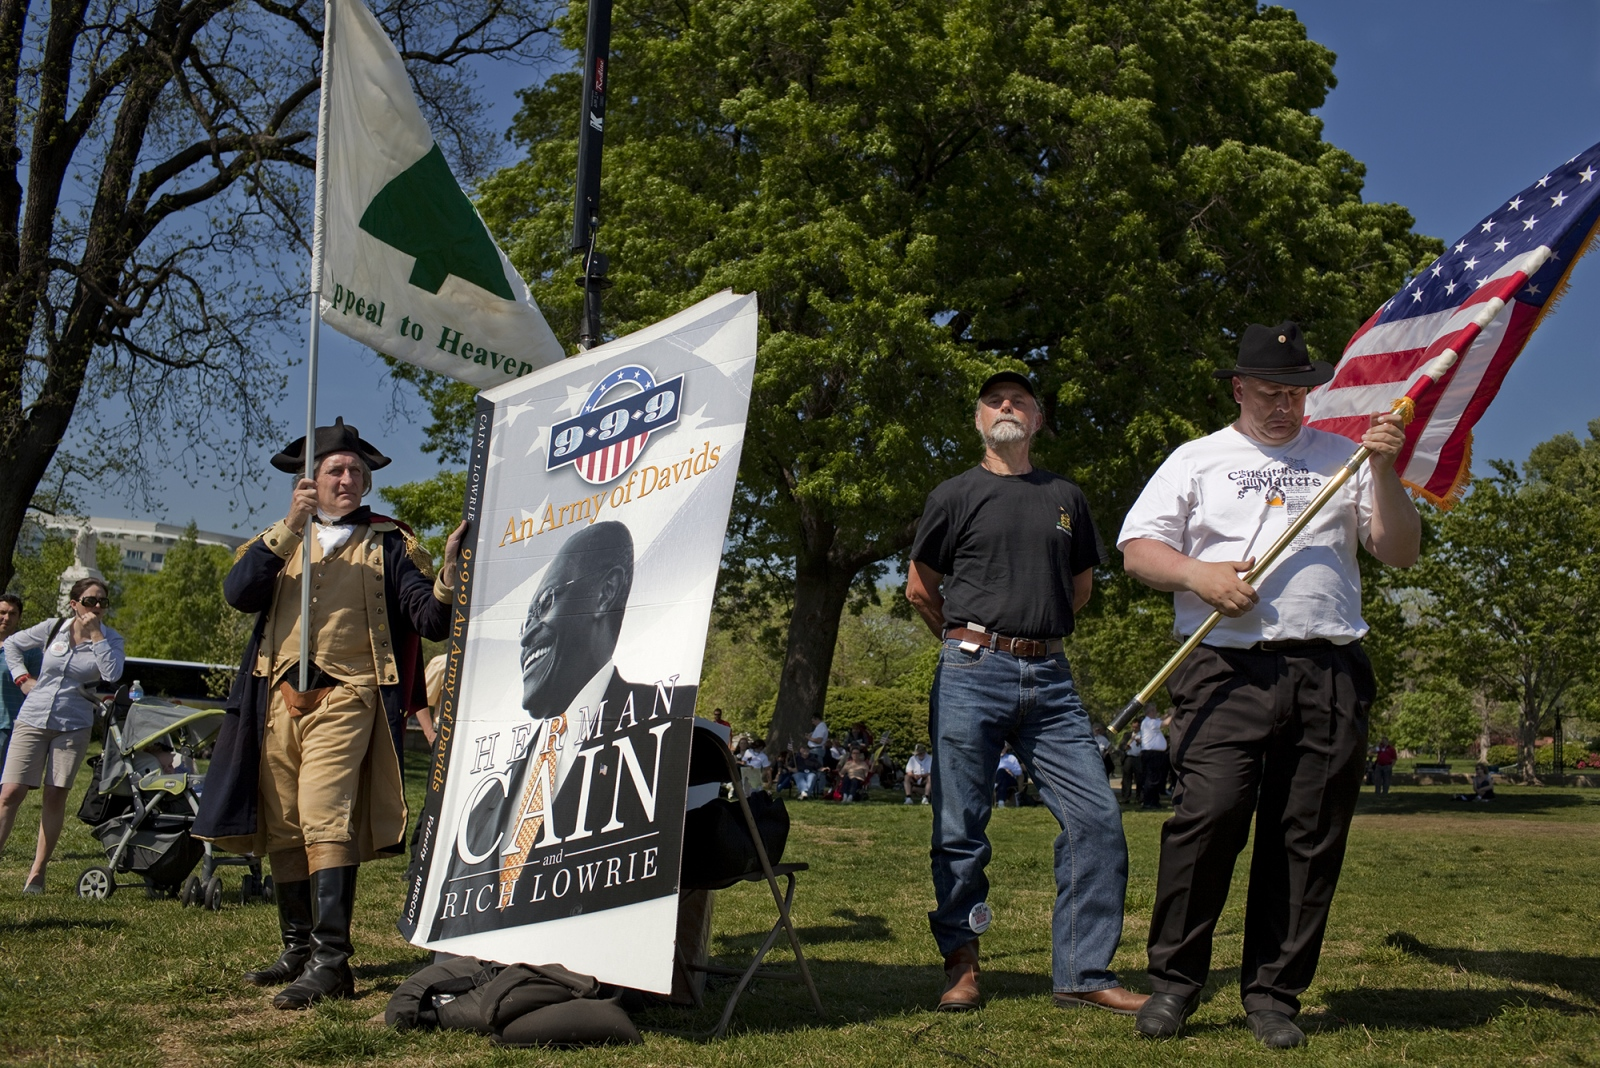 Herman Cain rally,D.C.